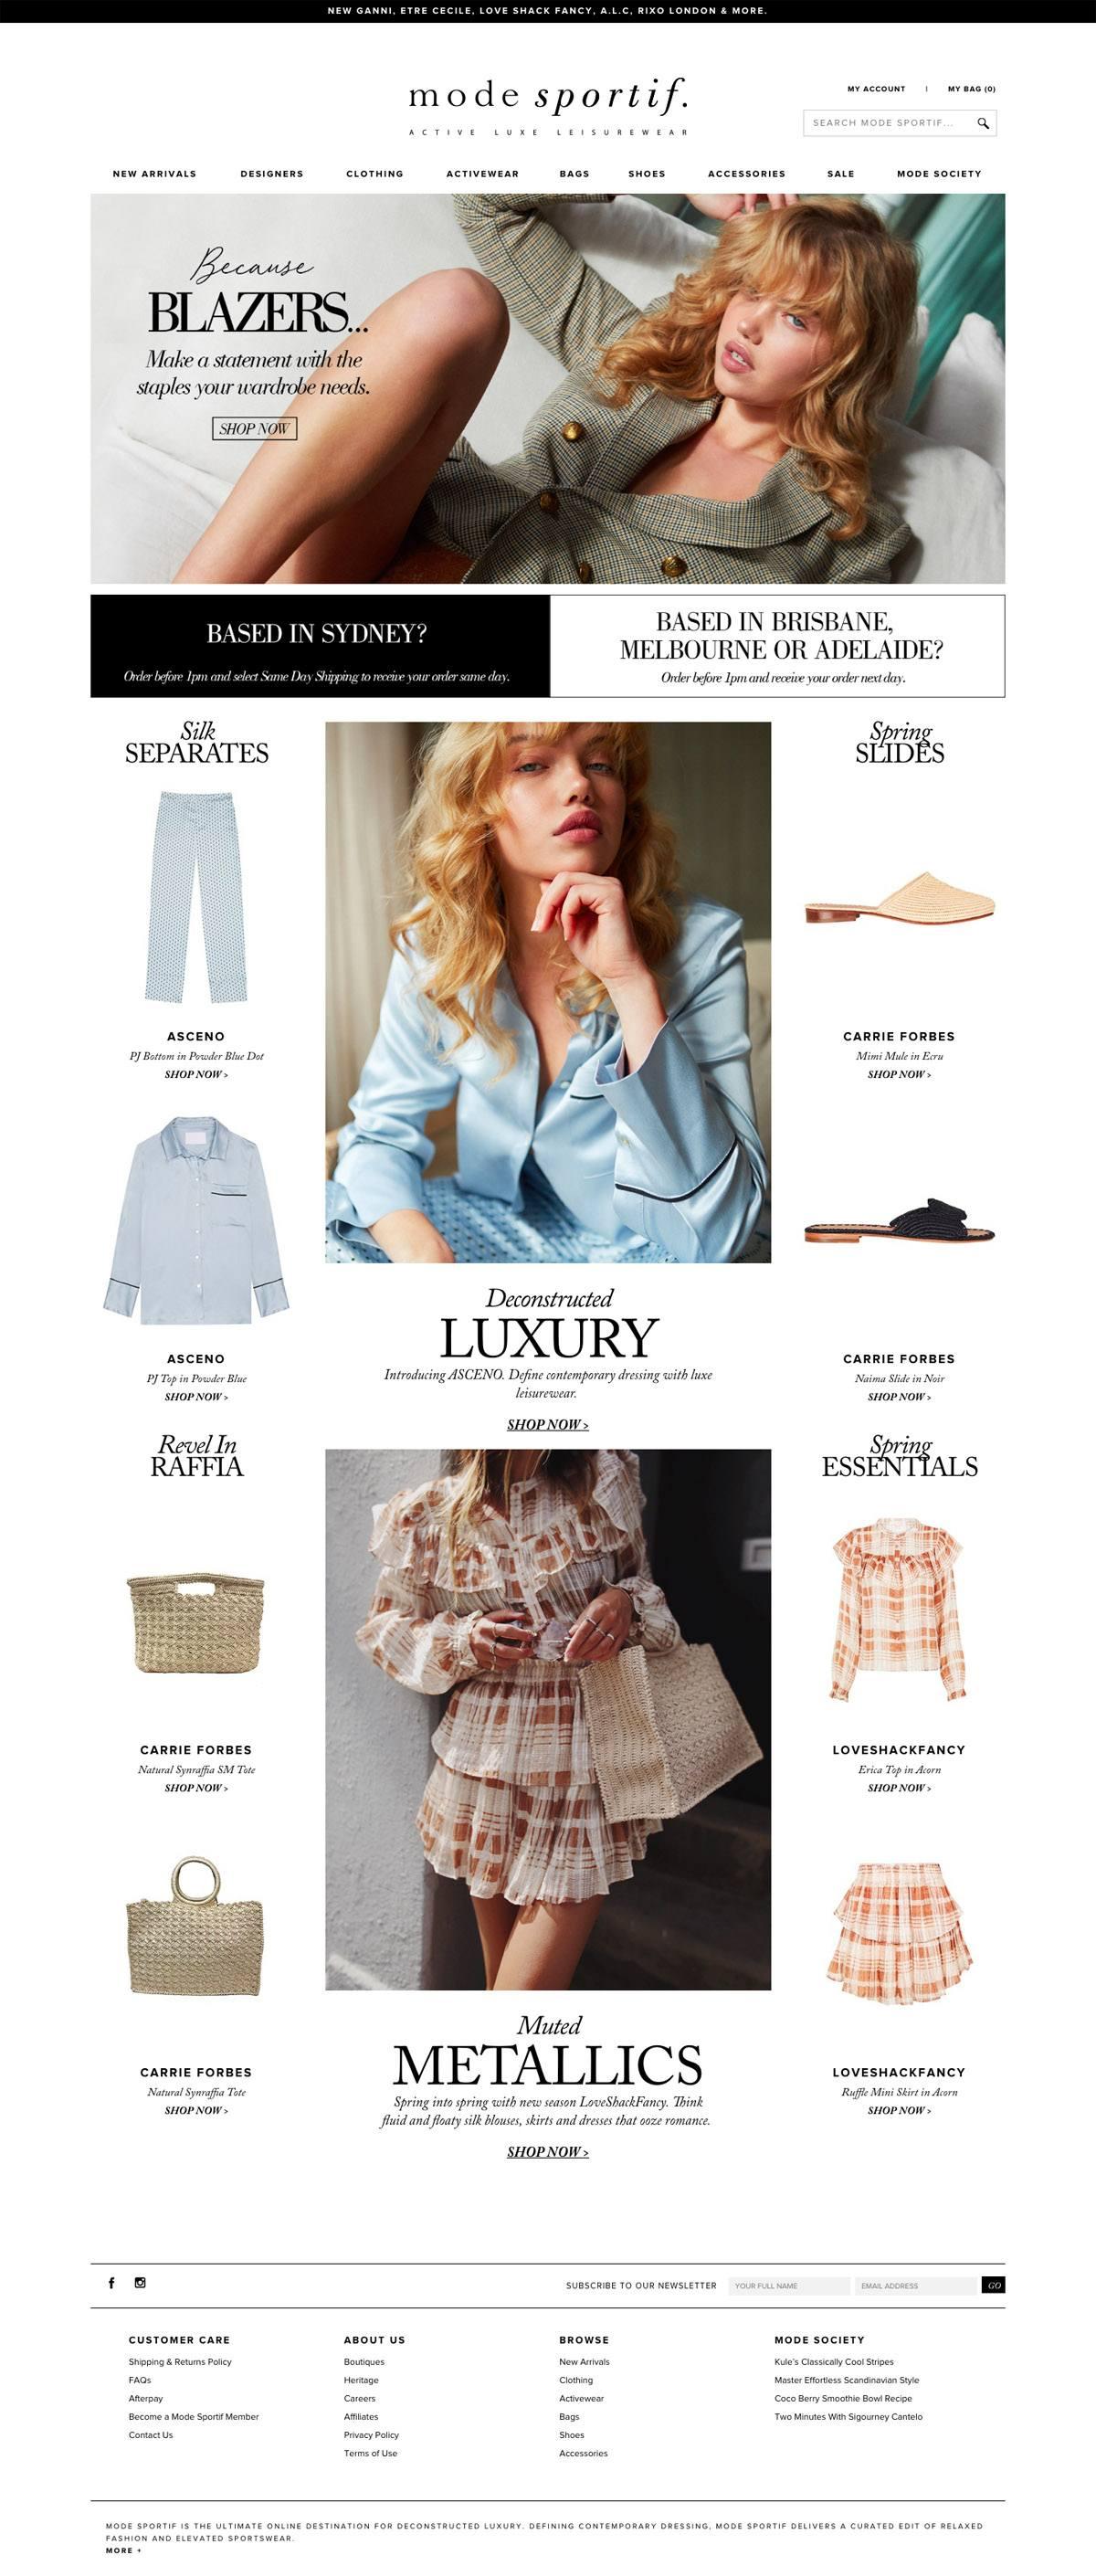 eCommerce website: Mode Sportif